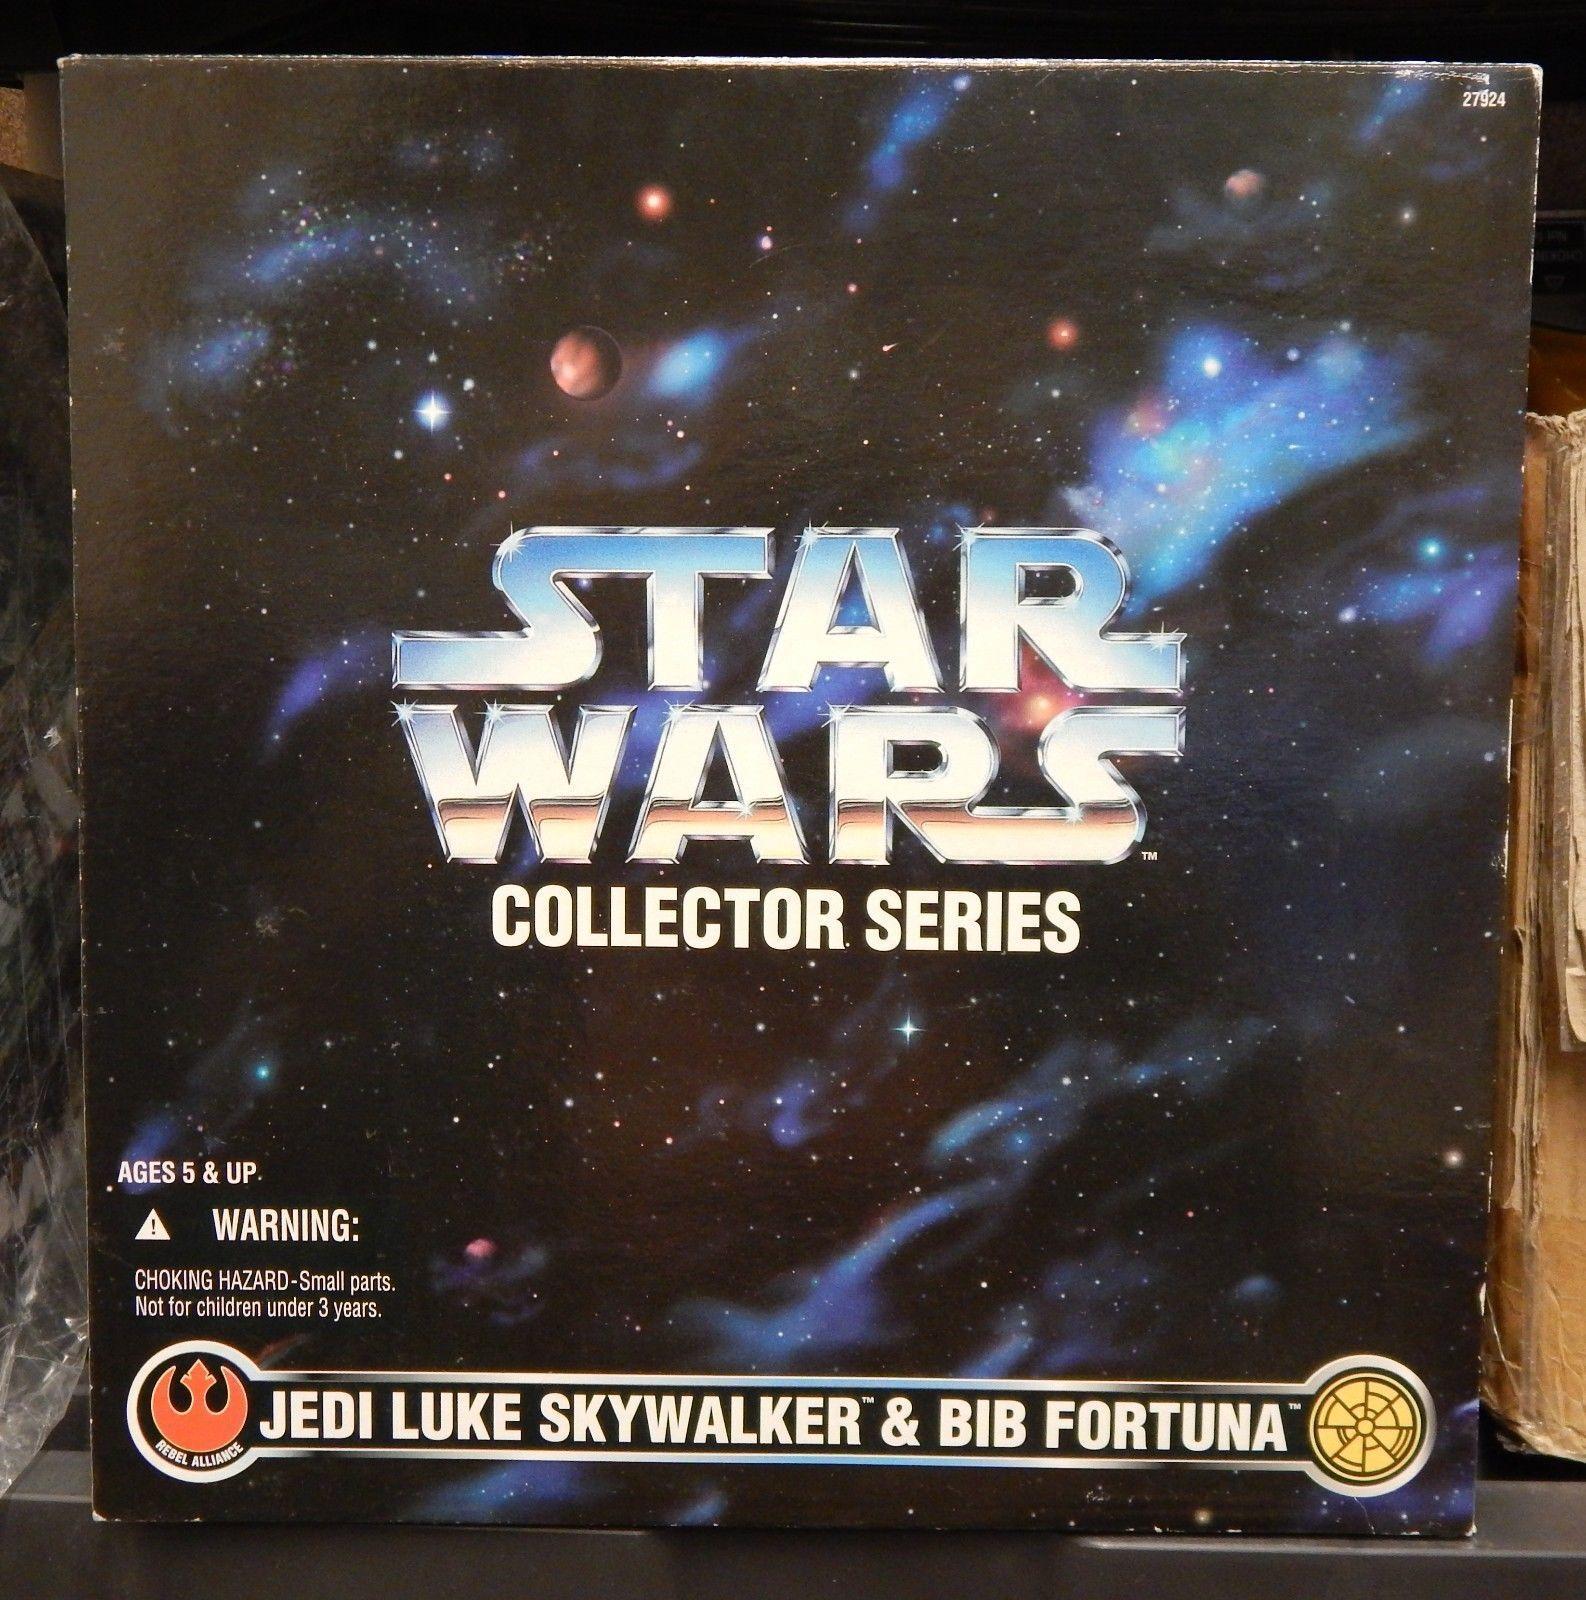 Star Wars Jedi Luke Skywalker & Bib Fortuna 12  Action Figures Kenner 1997 New